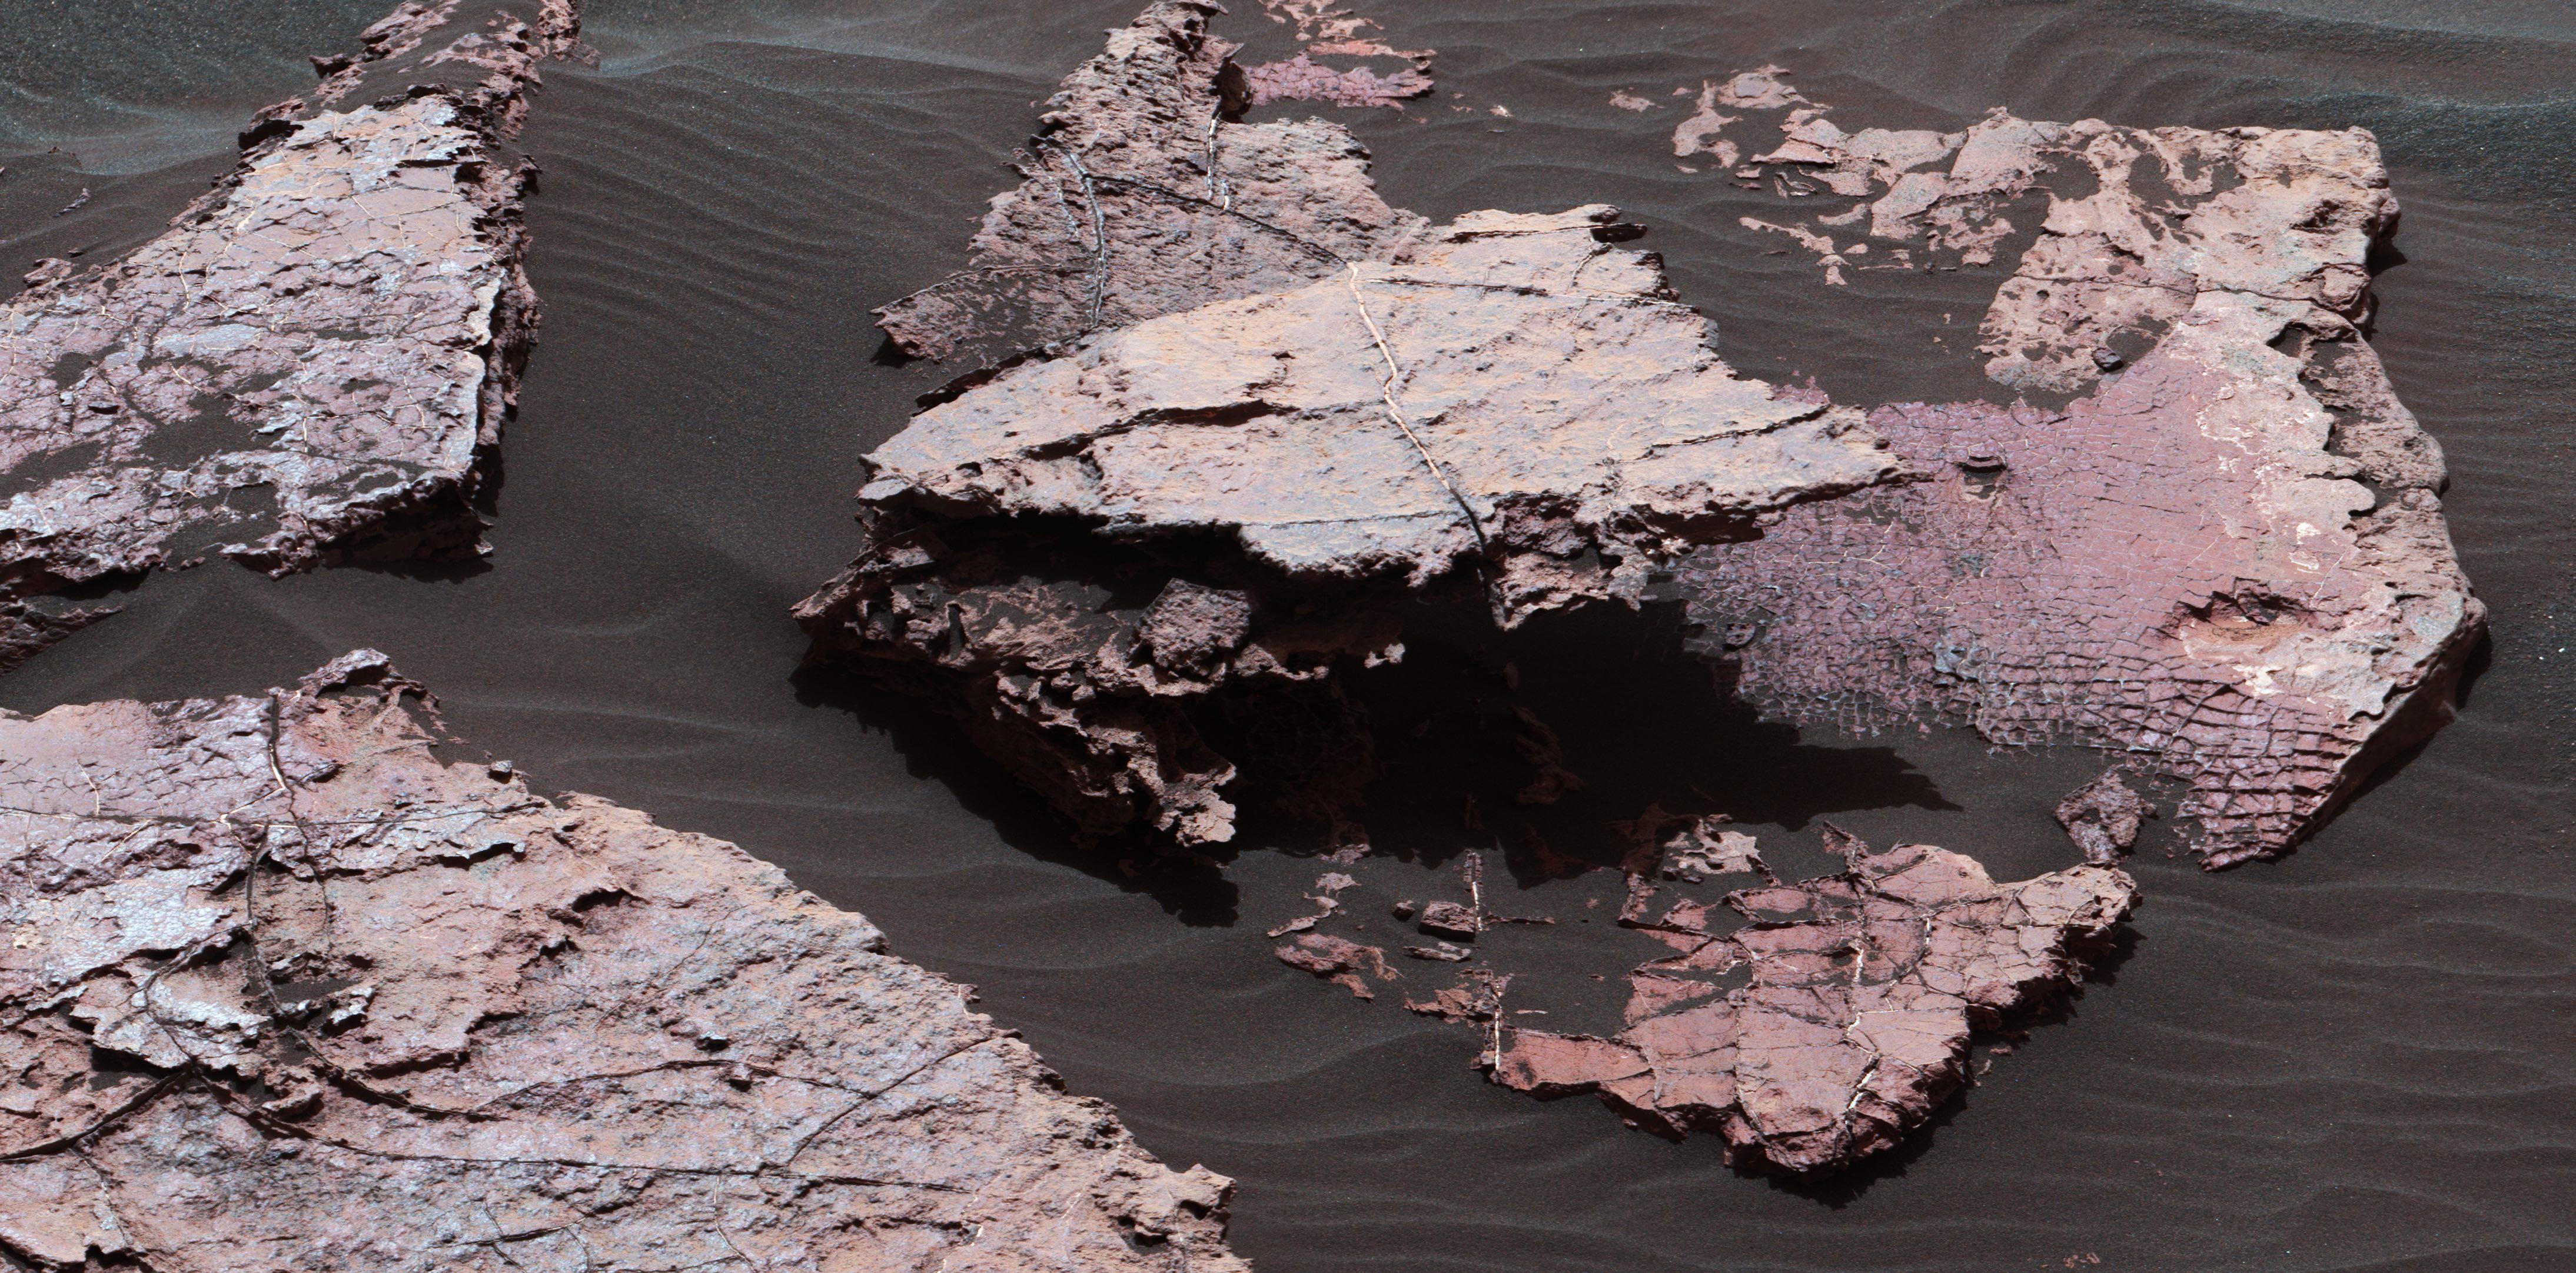 more more more mars mud